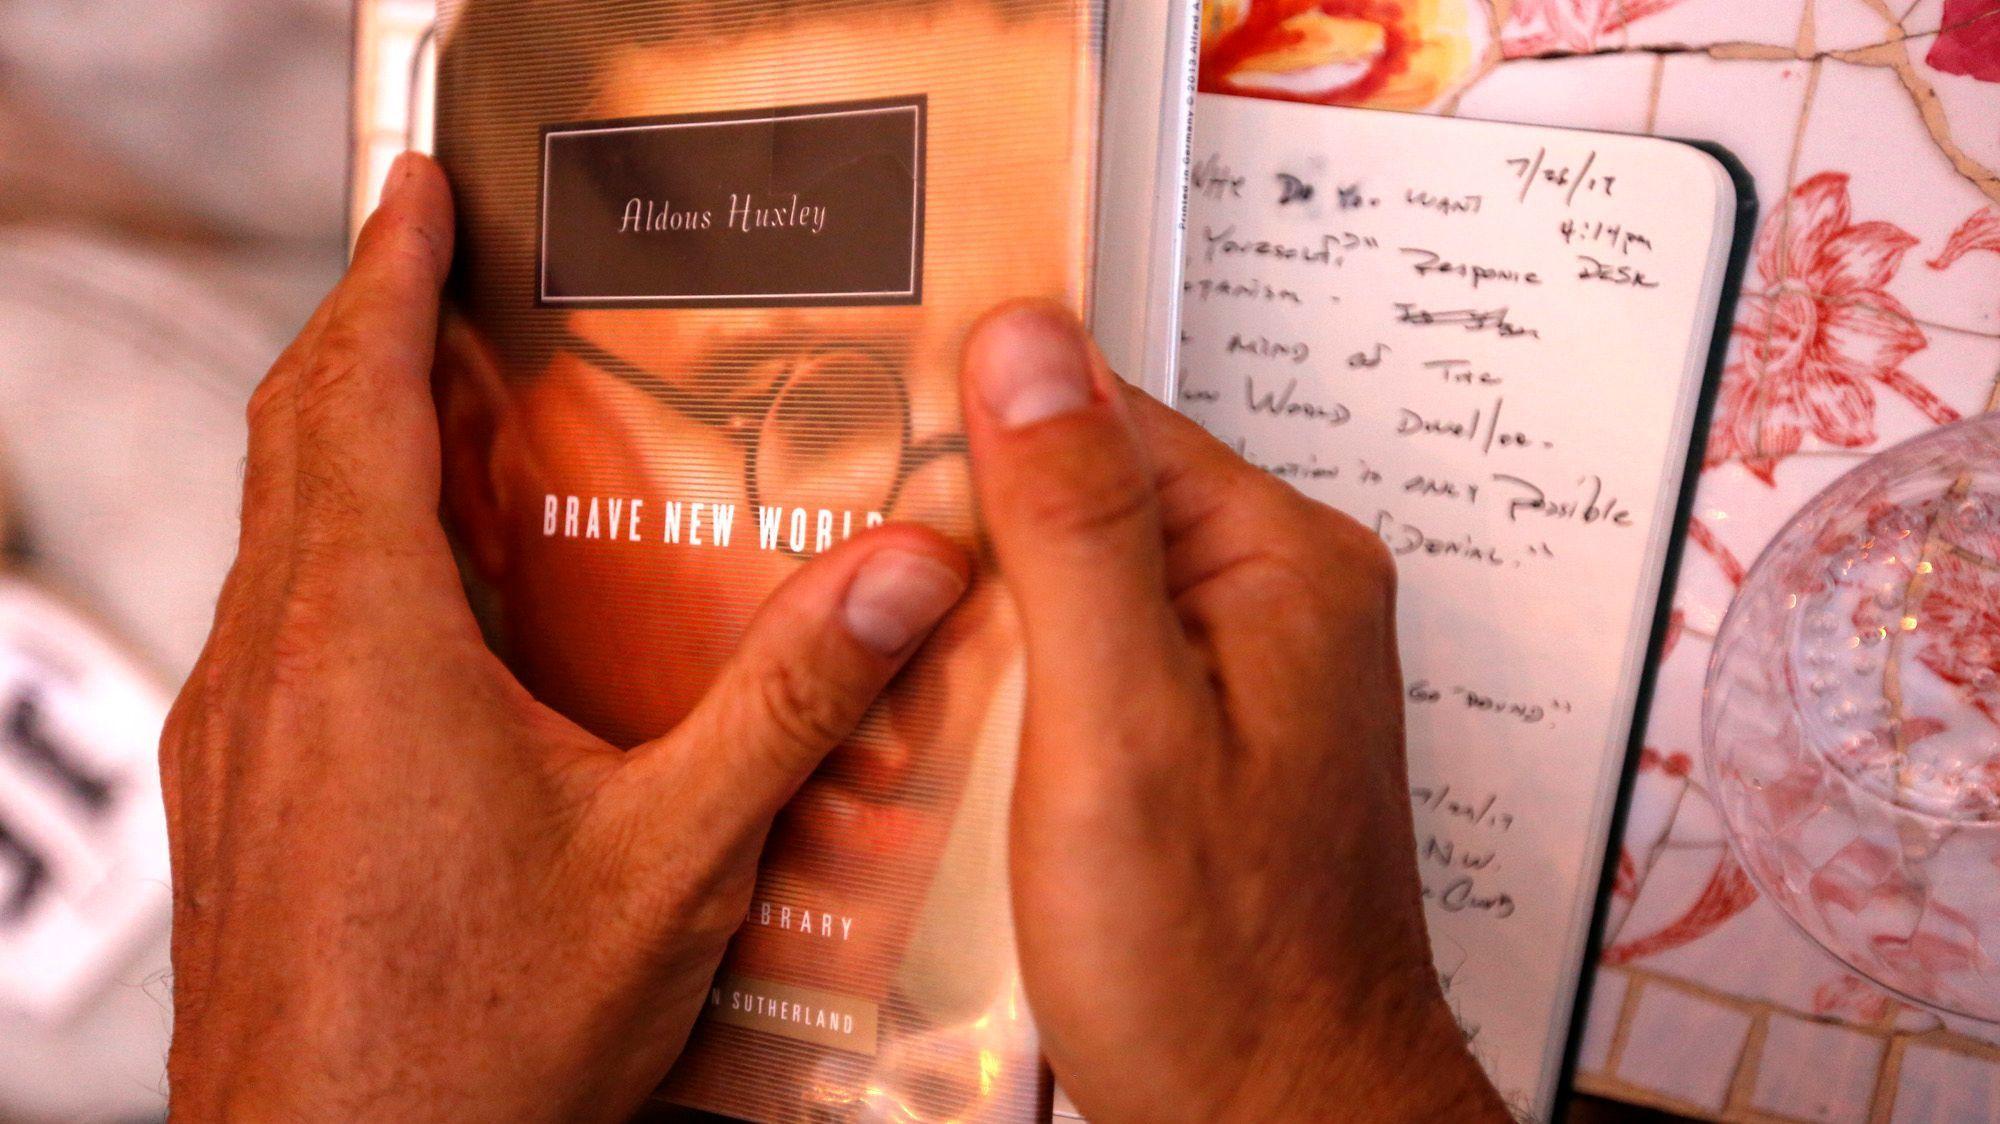 Joshua Levine holds a copy of Aldous Huxley's